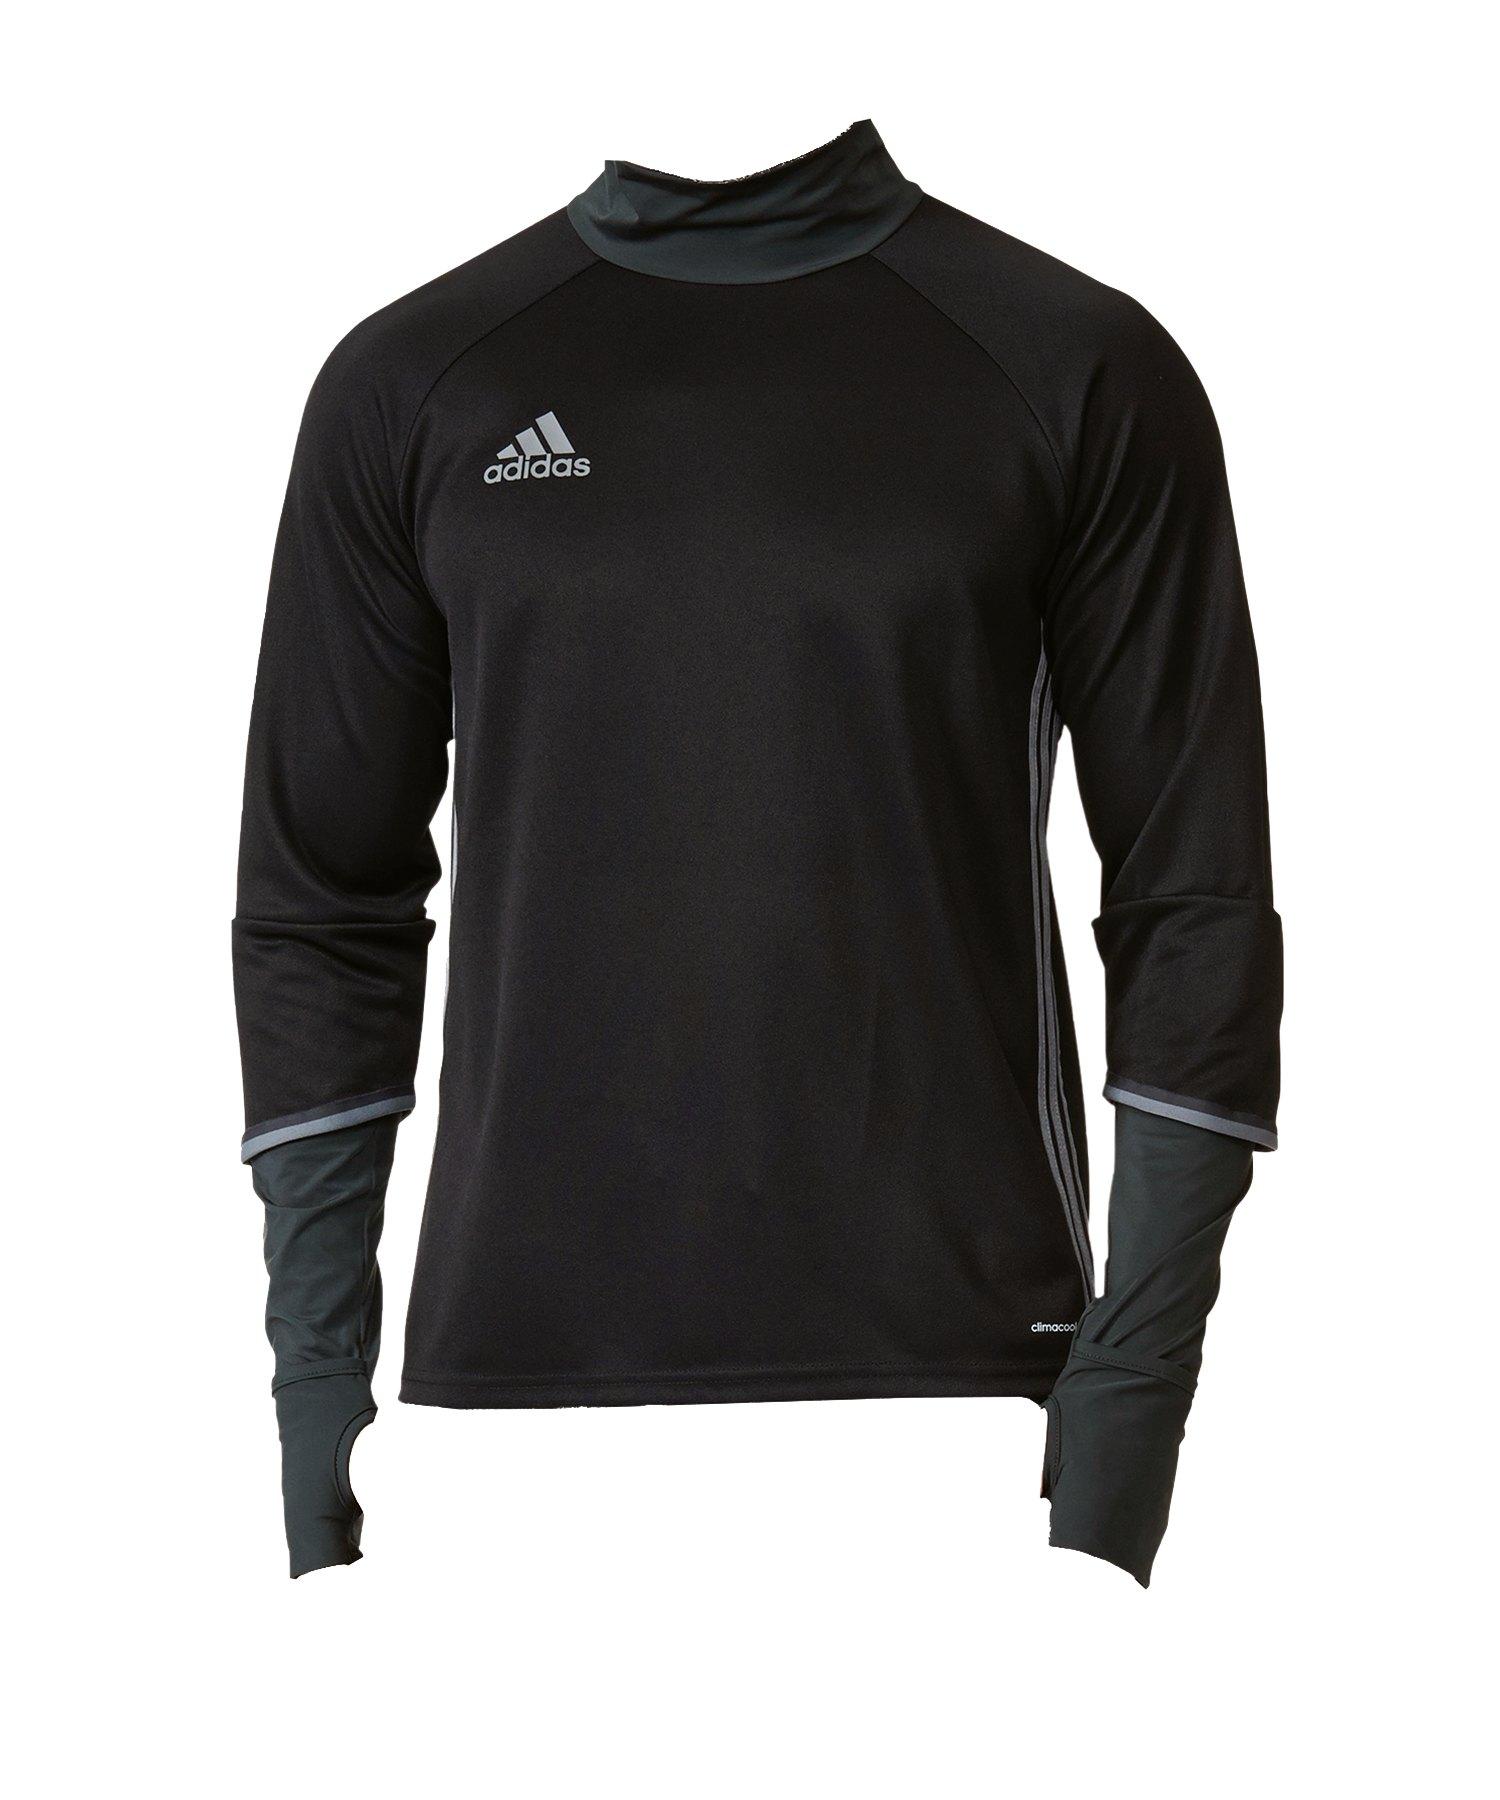 adidas Condivo 16 Training Top Schwarz Grau - schwarz